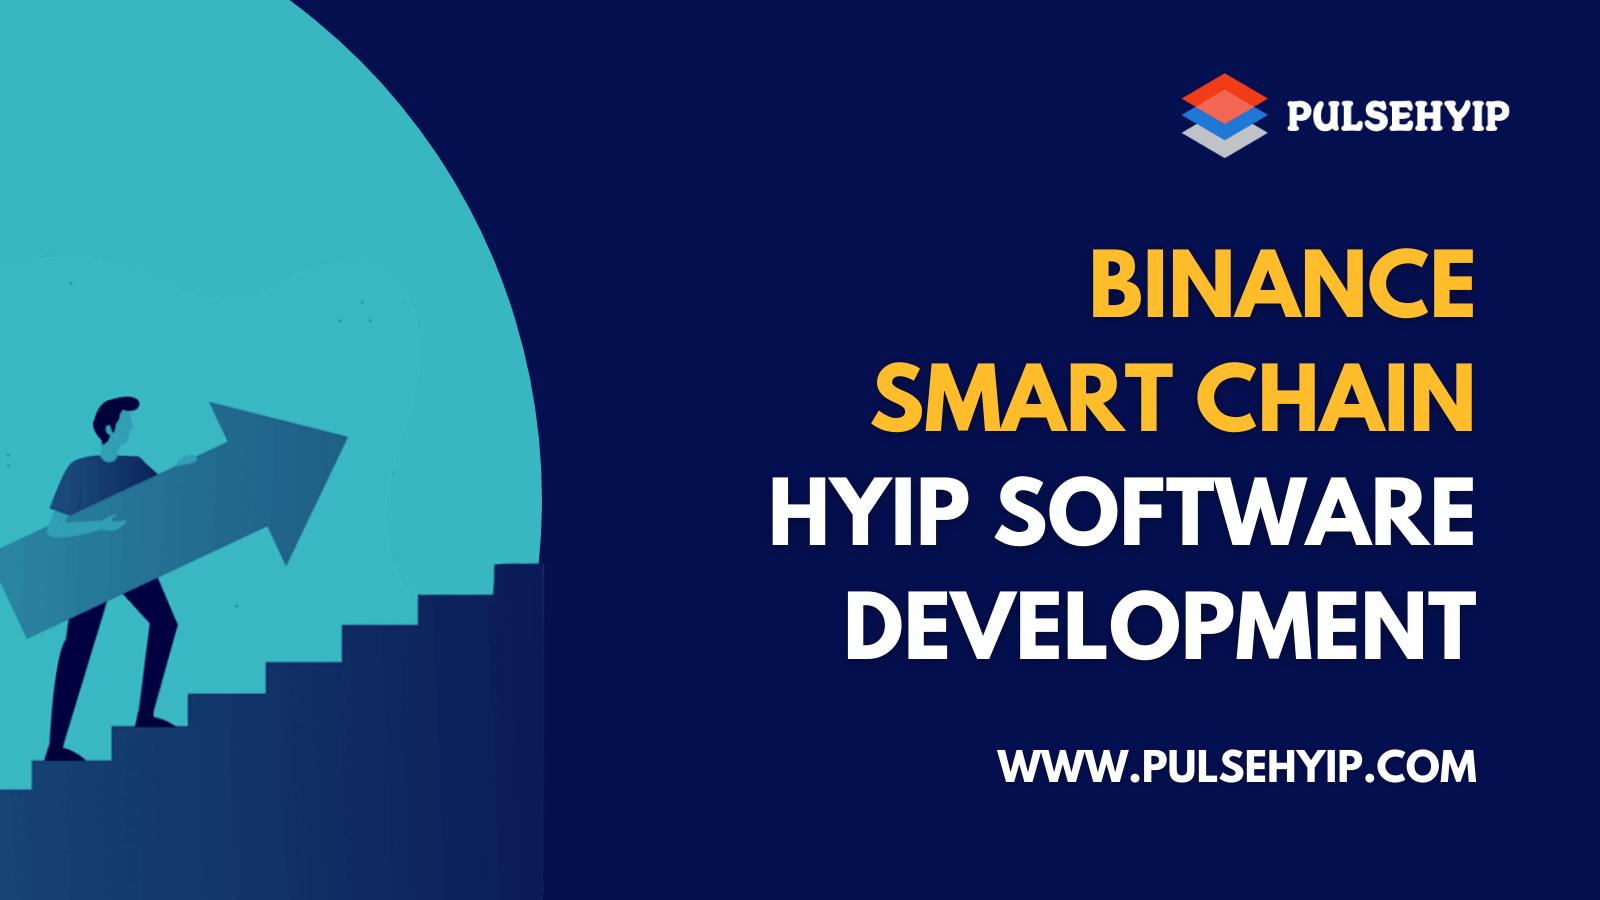 Binance Smart Chain Hyip Software Development